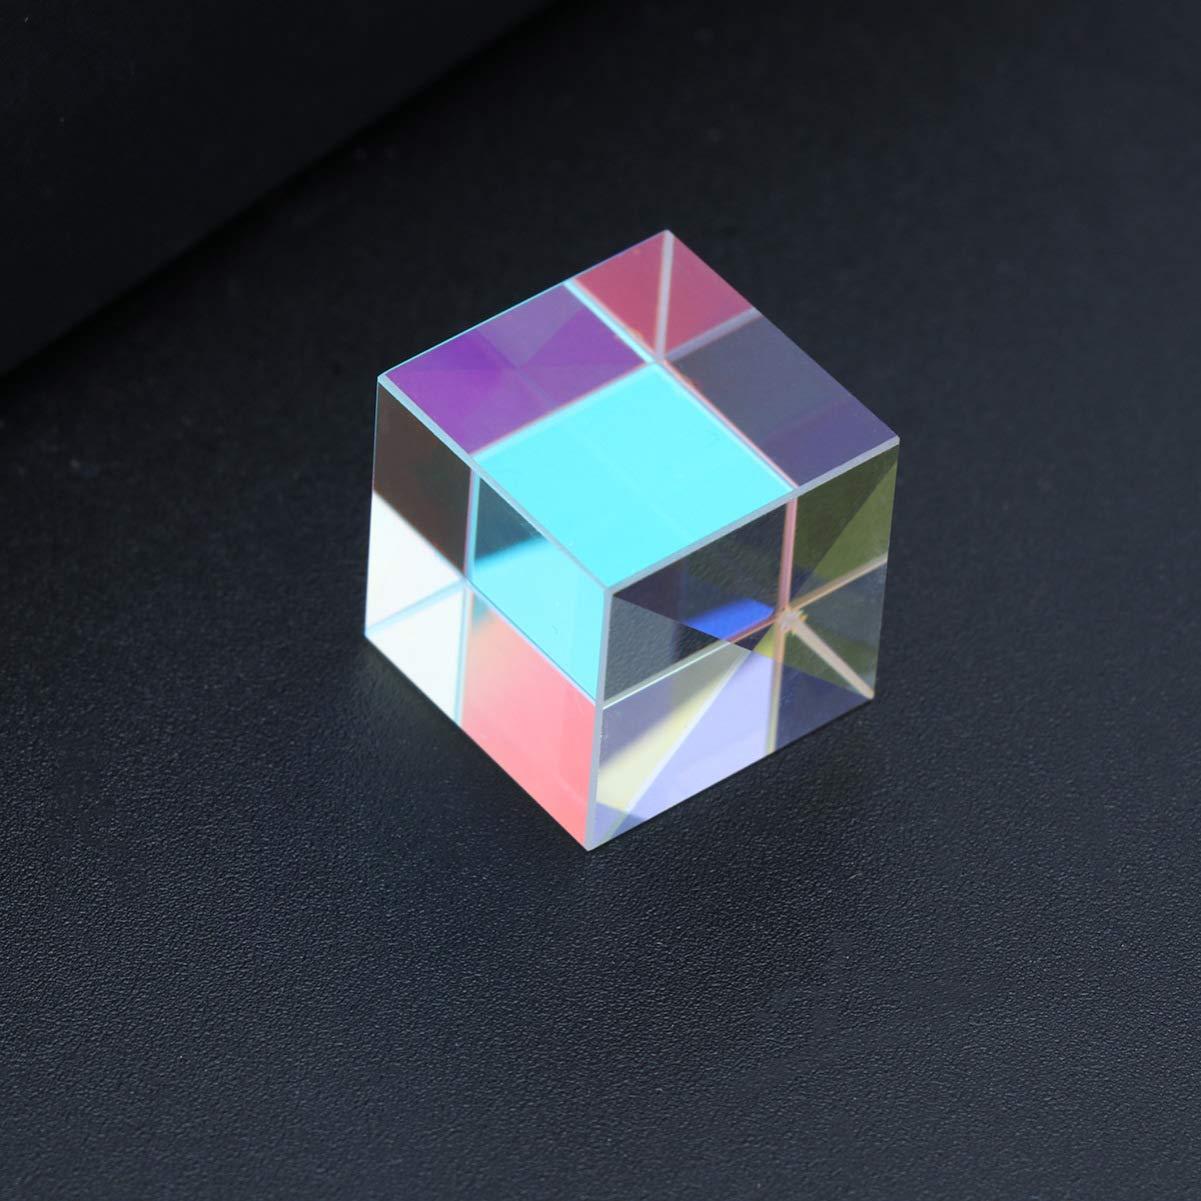 2 Sides United Scientific CUBAO2 Acrylic Cube Prism